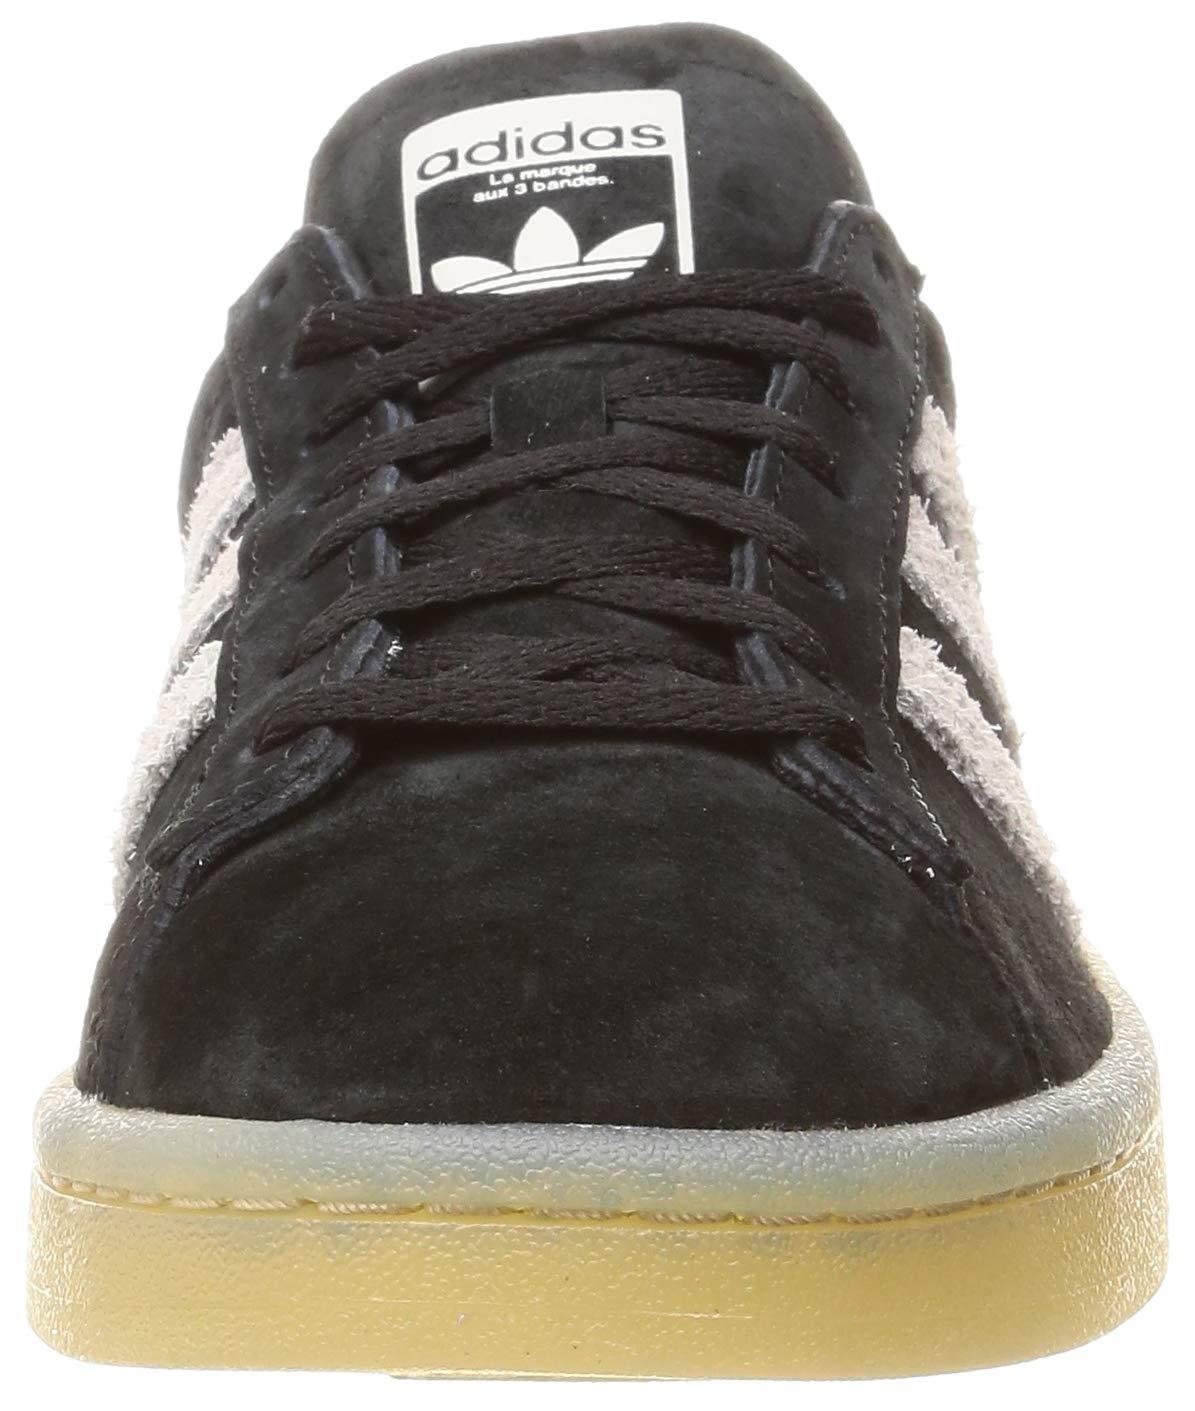 Adidas Originals Campus Sneaker Damen schwarz/Hellgrau, 4 - UK - 4 36 2/3 EU - 5.5 US  - afb3c7